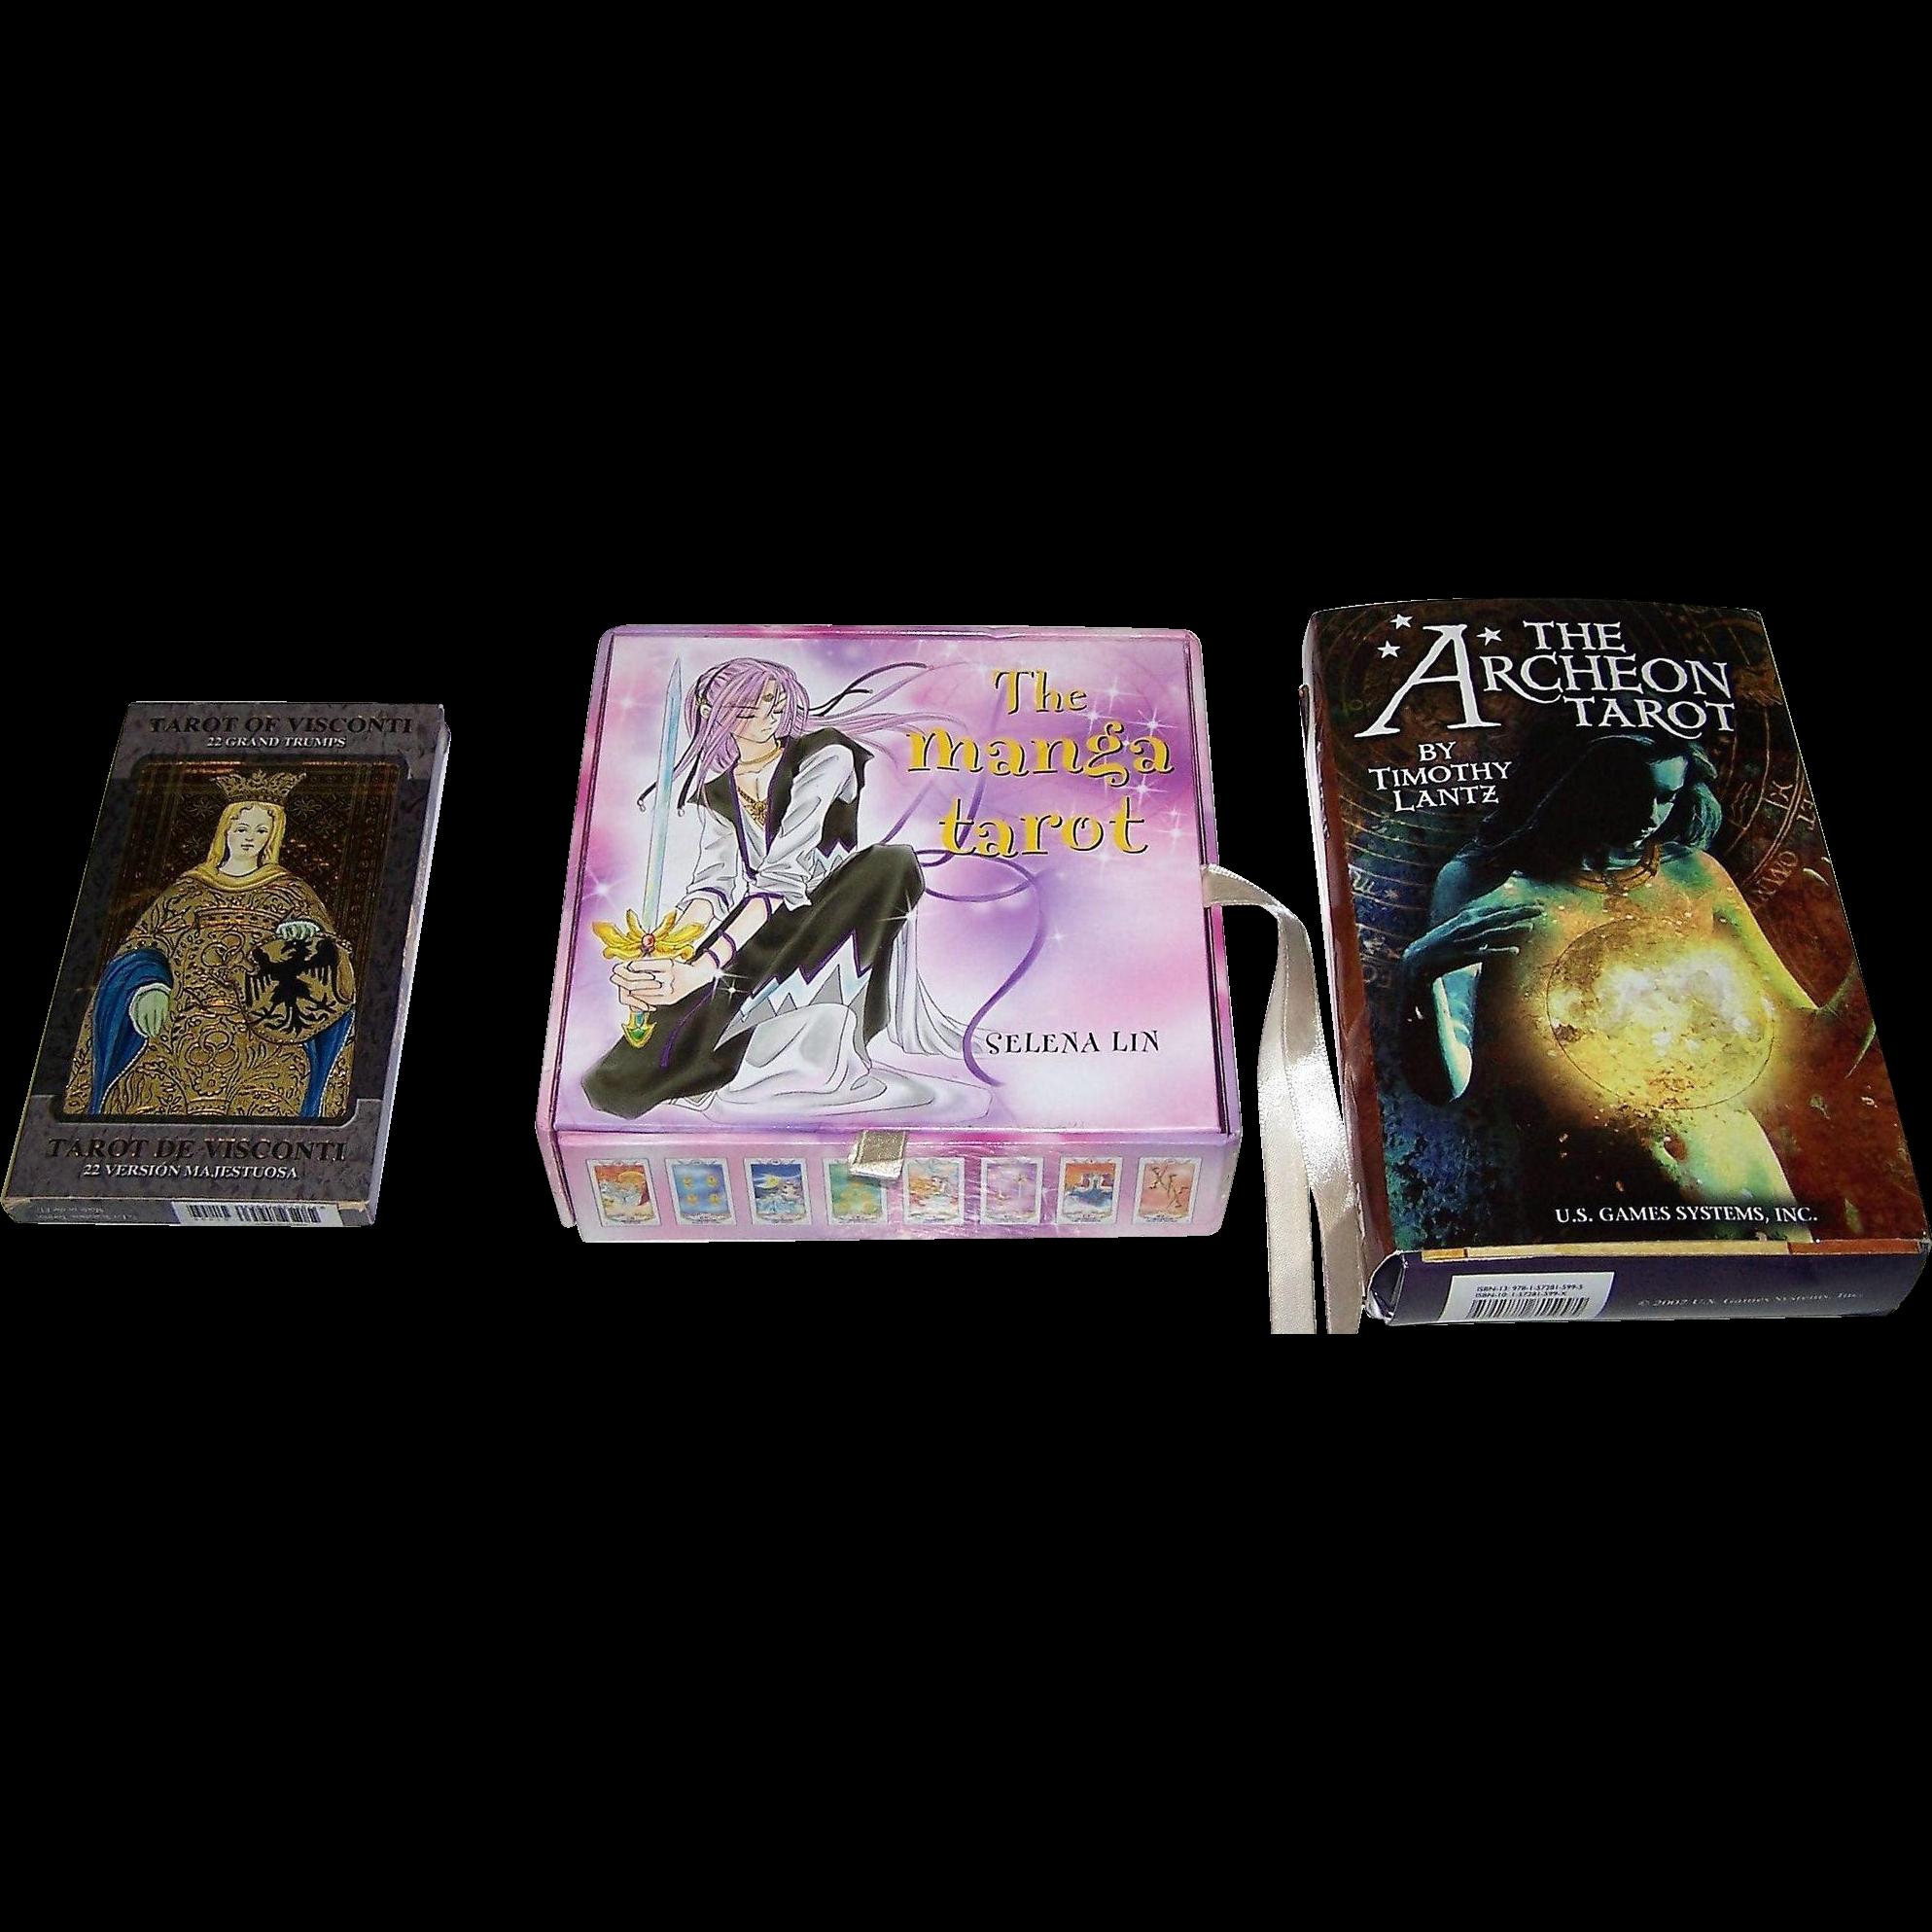 "3 Sets of Tarot Cards, $15/ea.: (i) Lo Scarabeo ""Tarot of Visconti"" (Majors Only); (ii) St. Martin's Griffin ""The Manga Tarot""; (iii) U.S. Games Systems ""The Archeon Tarot"""